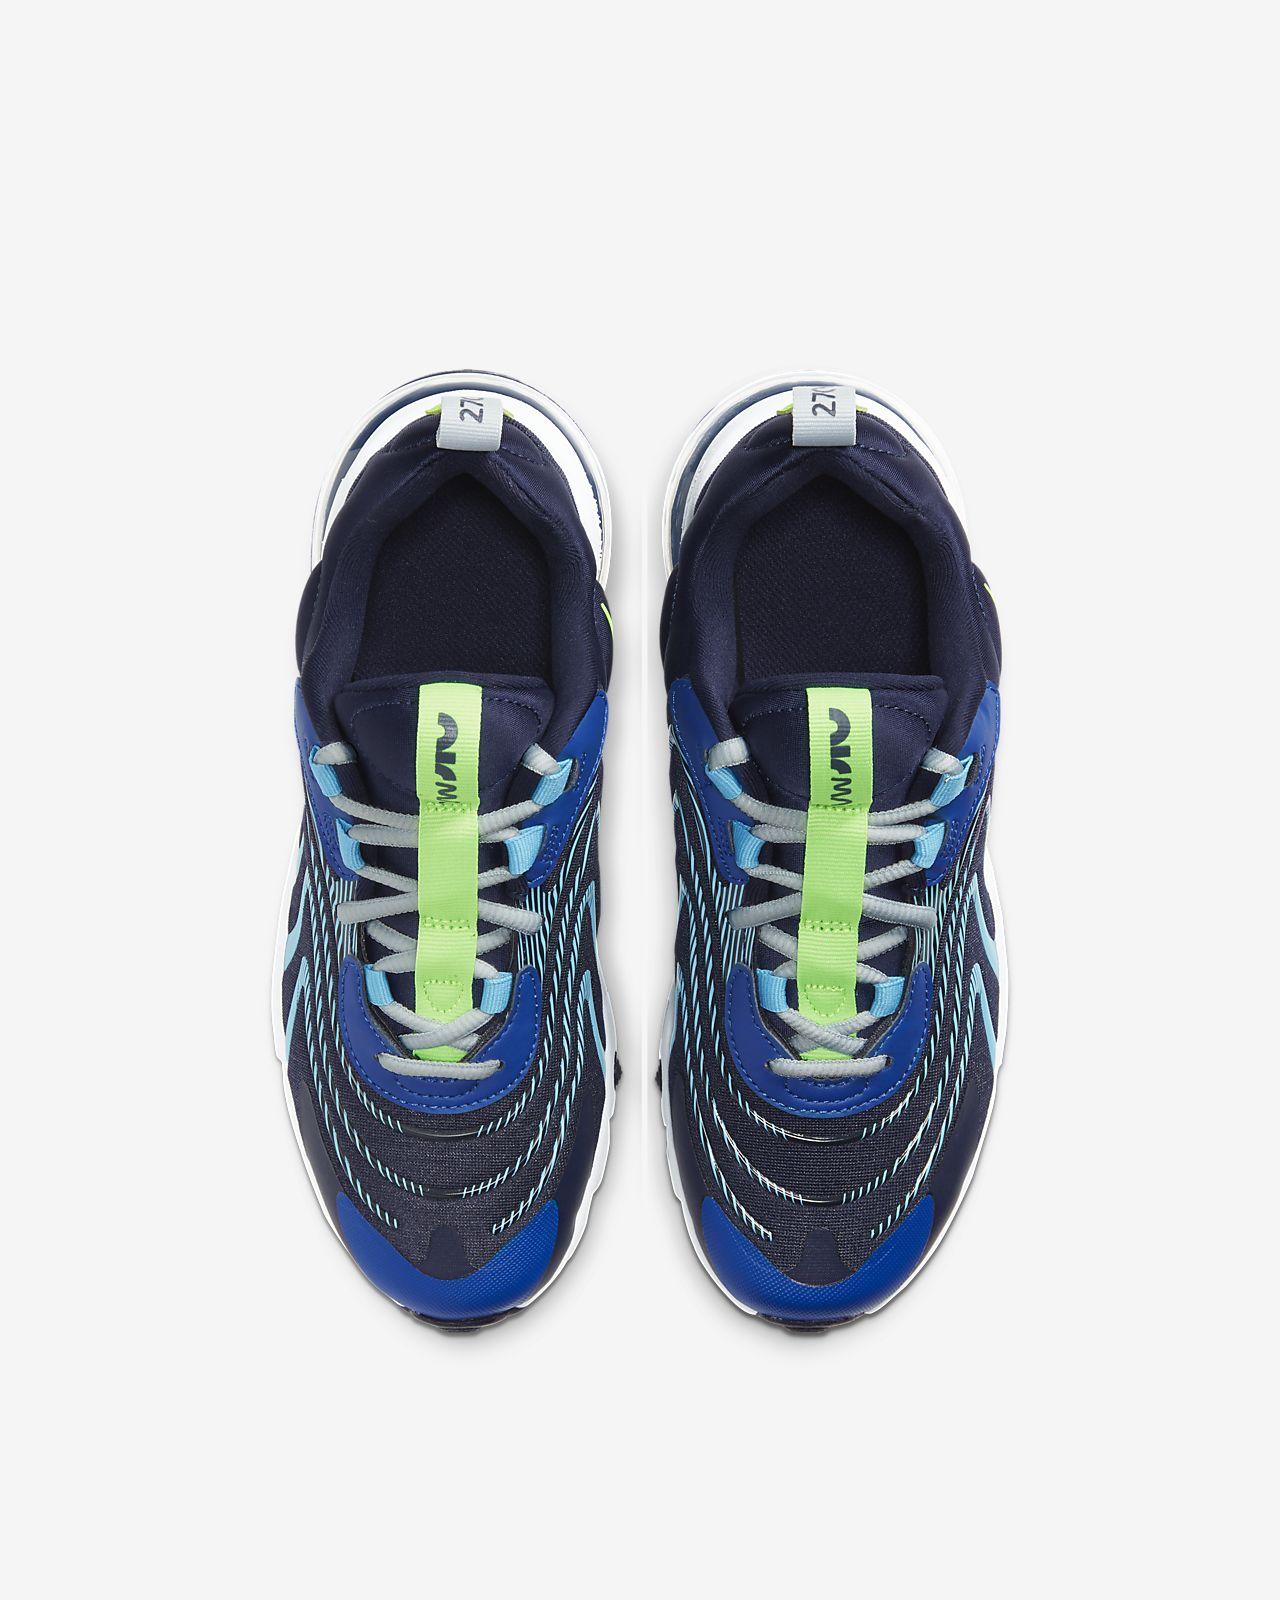 Sko Nike Air Max 270 React ENG för ungdom. Nike SE